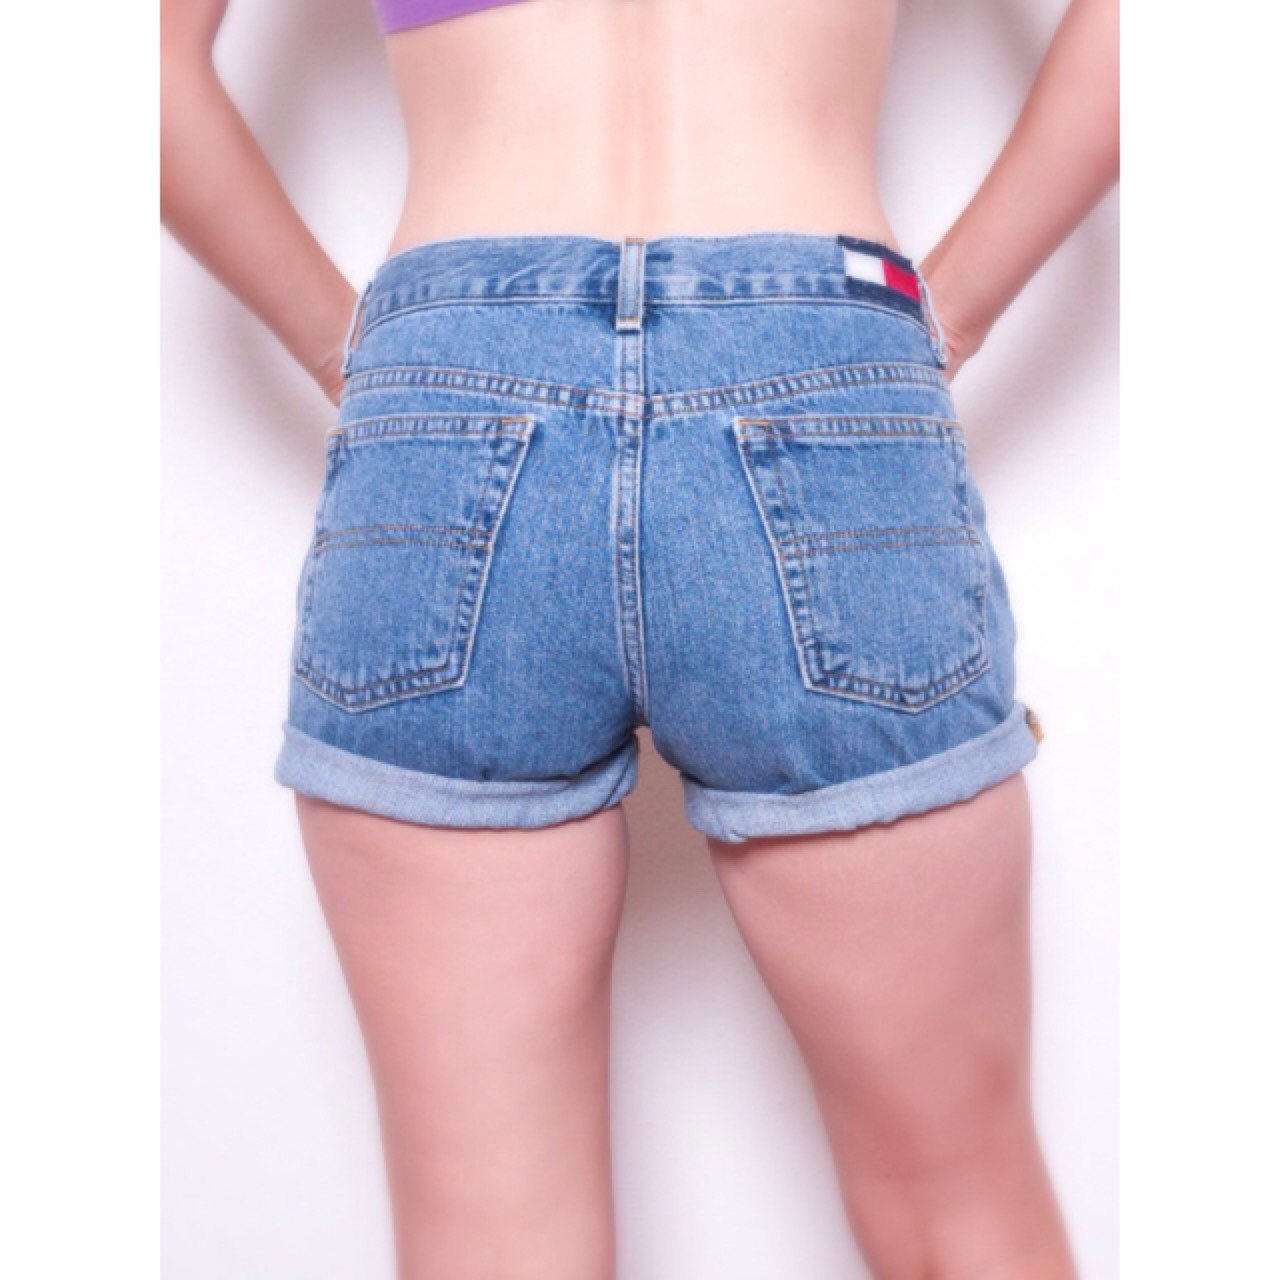 Hilfiger Jean Shorts \\ Tommy Hilfiger Jeans \\ High Waisted ...